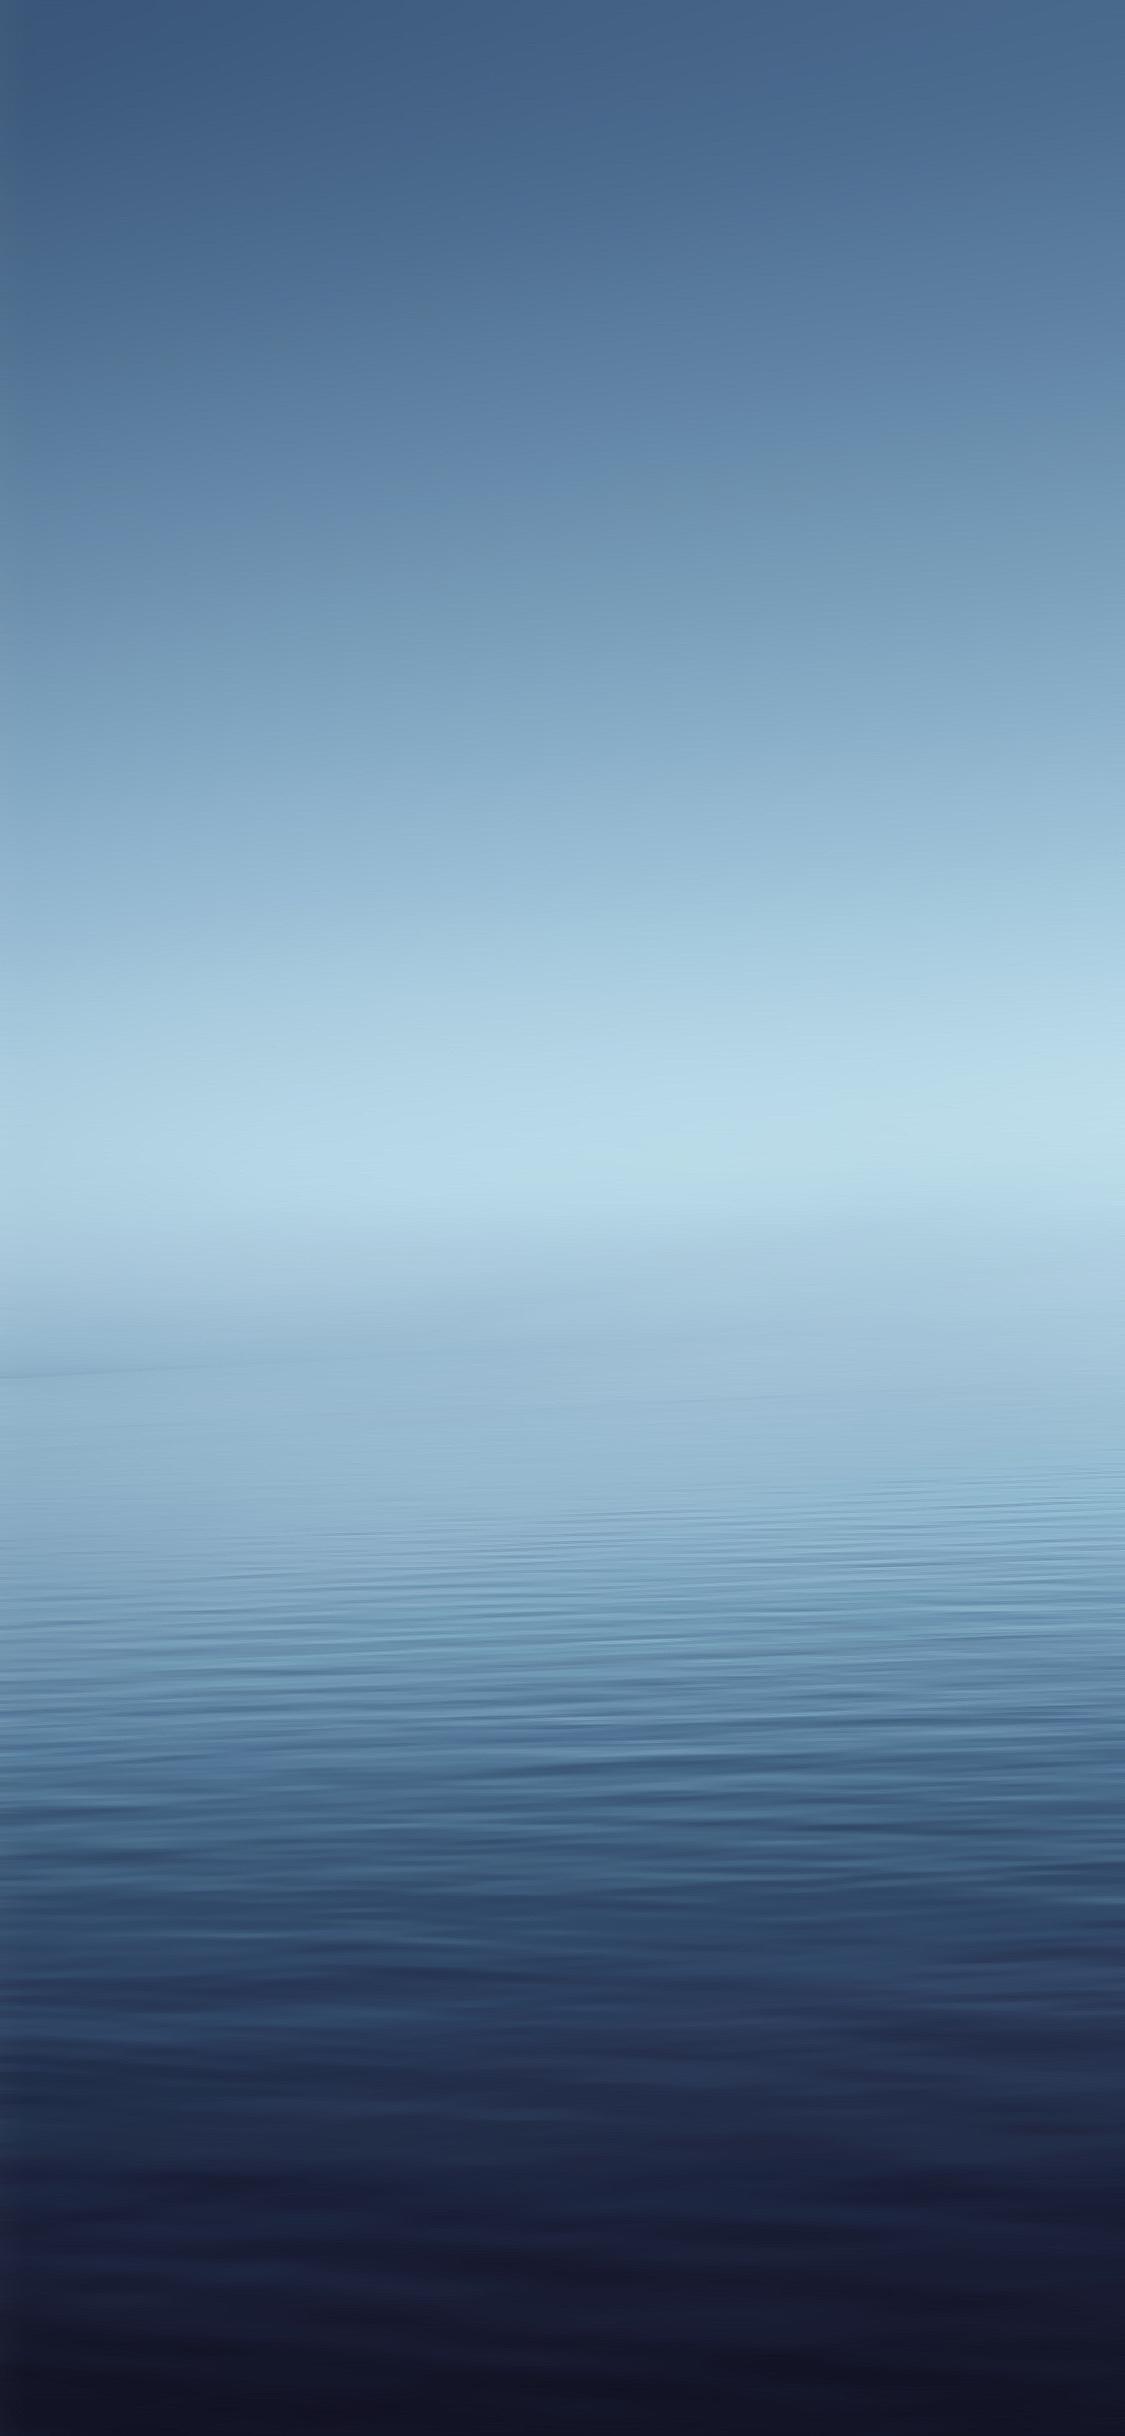 Wallpaper of calm water